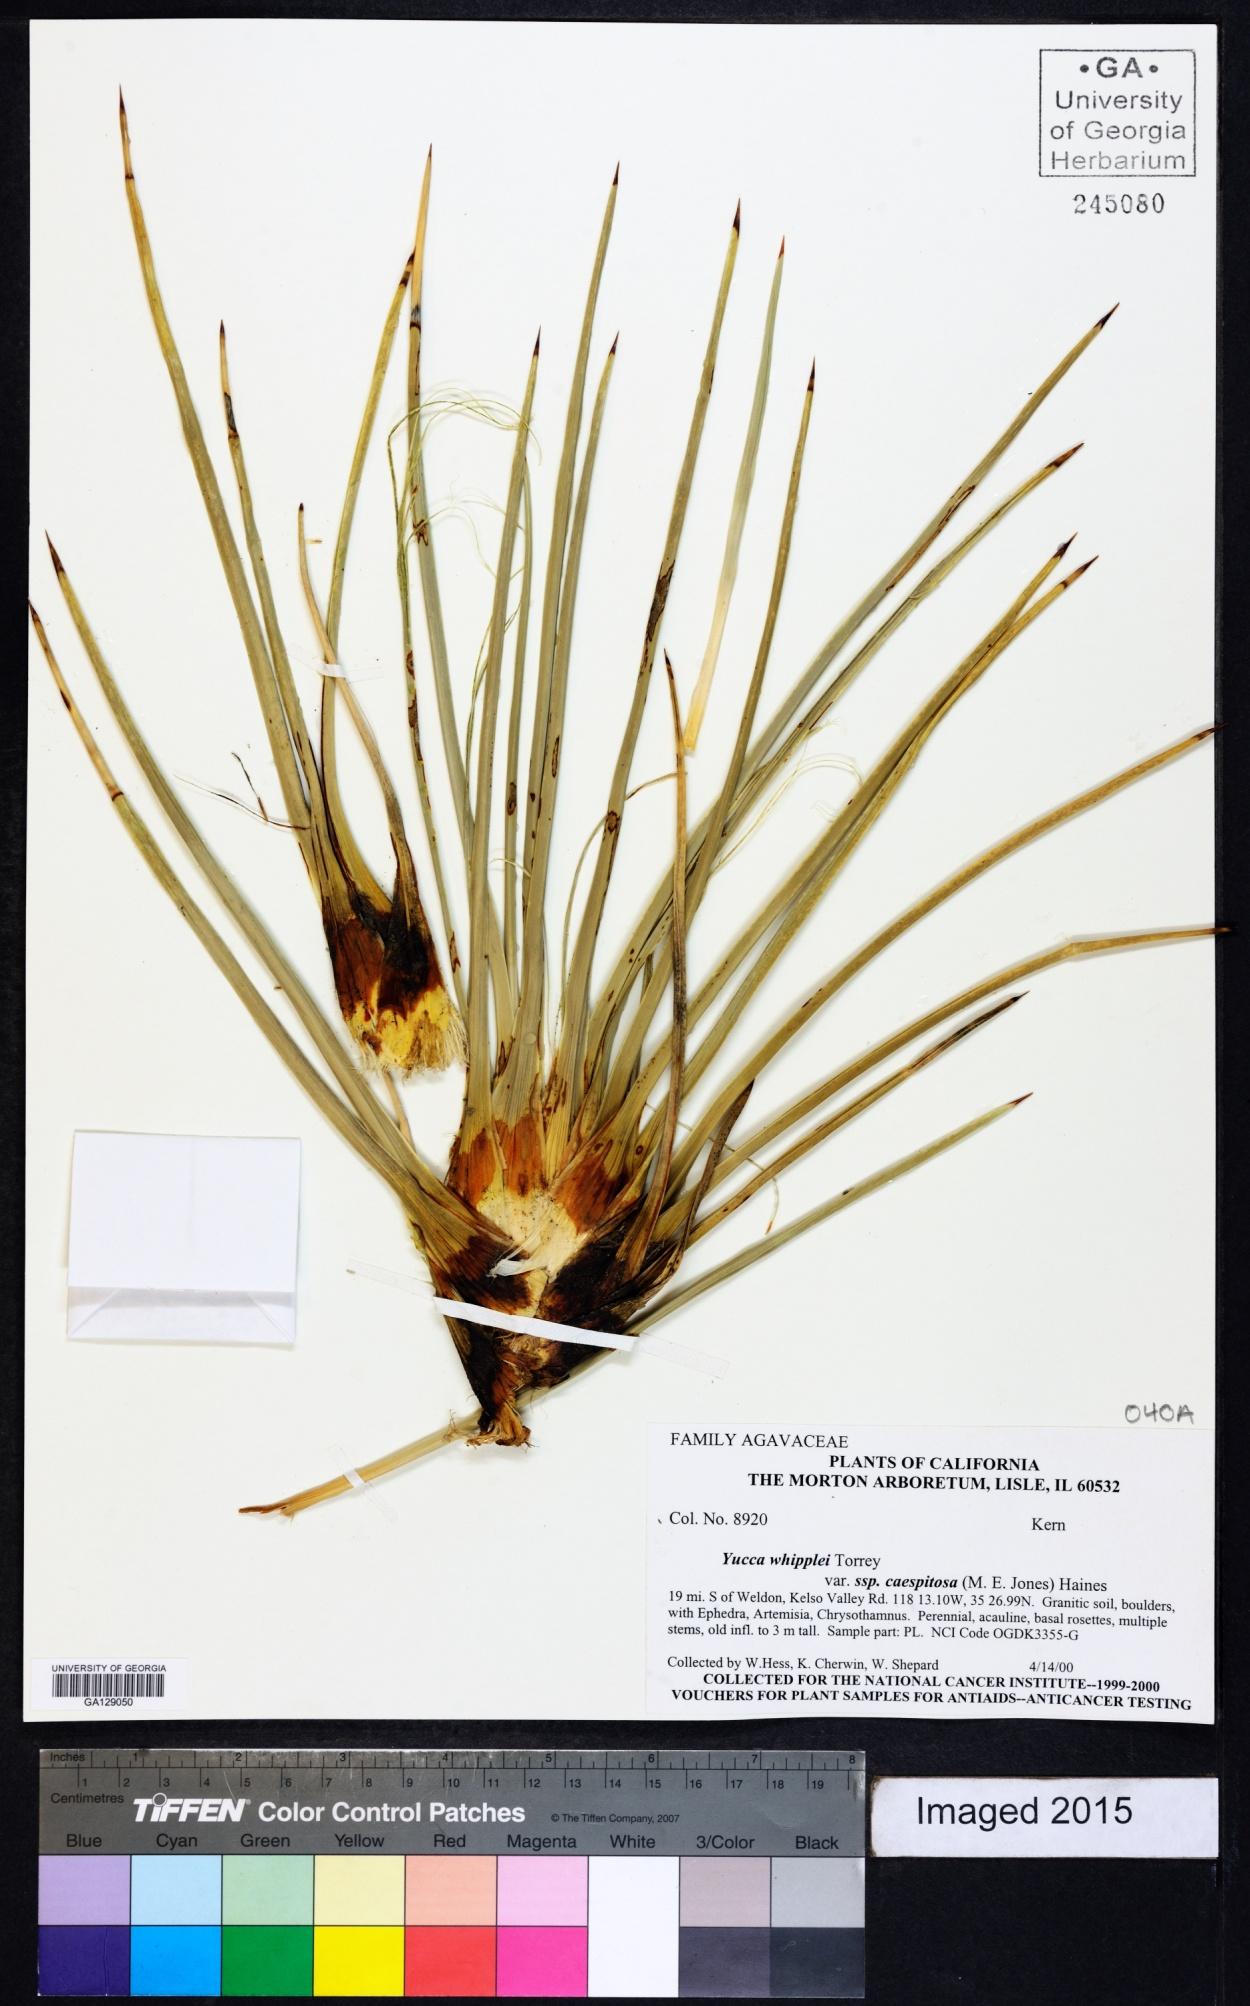 Yucca whipplei var. caespitosa image